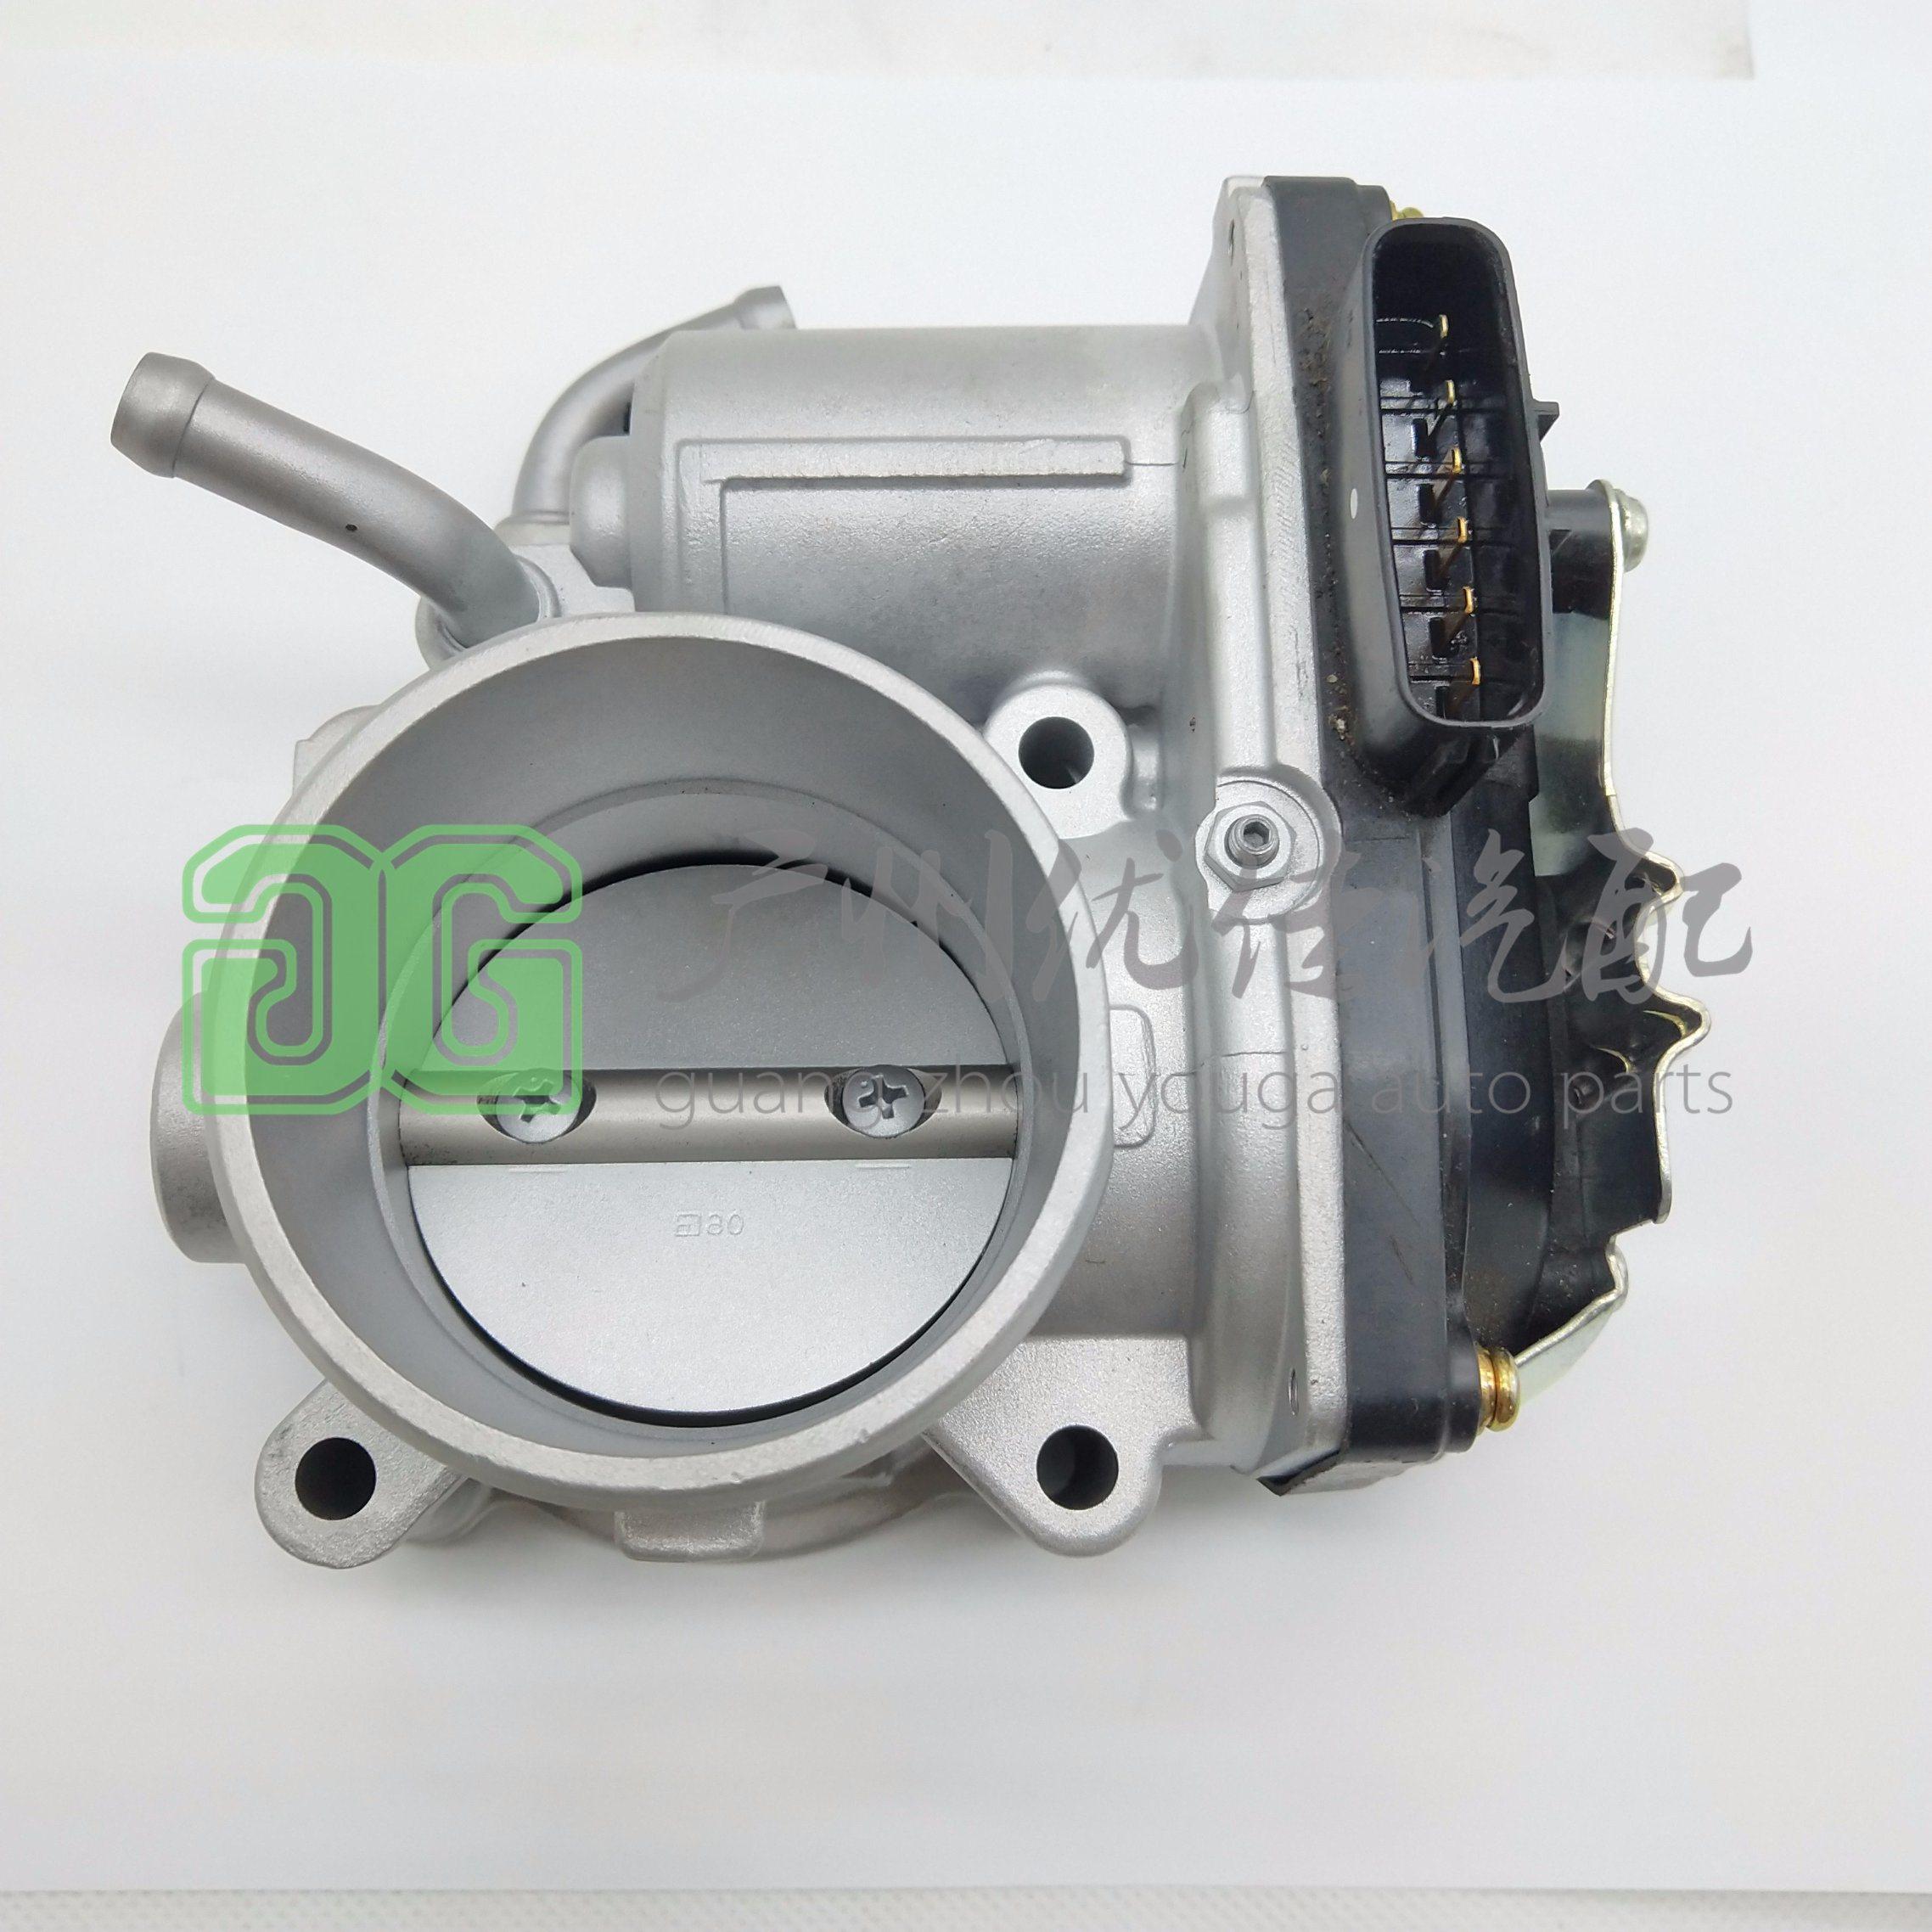 New Engine Throttle Body 1450A101 For Mitsubishi 2008-2012 Lancer Outlander